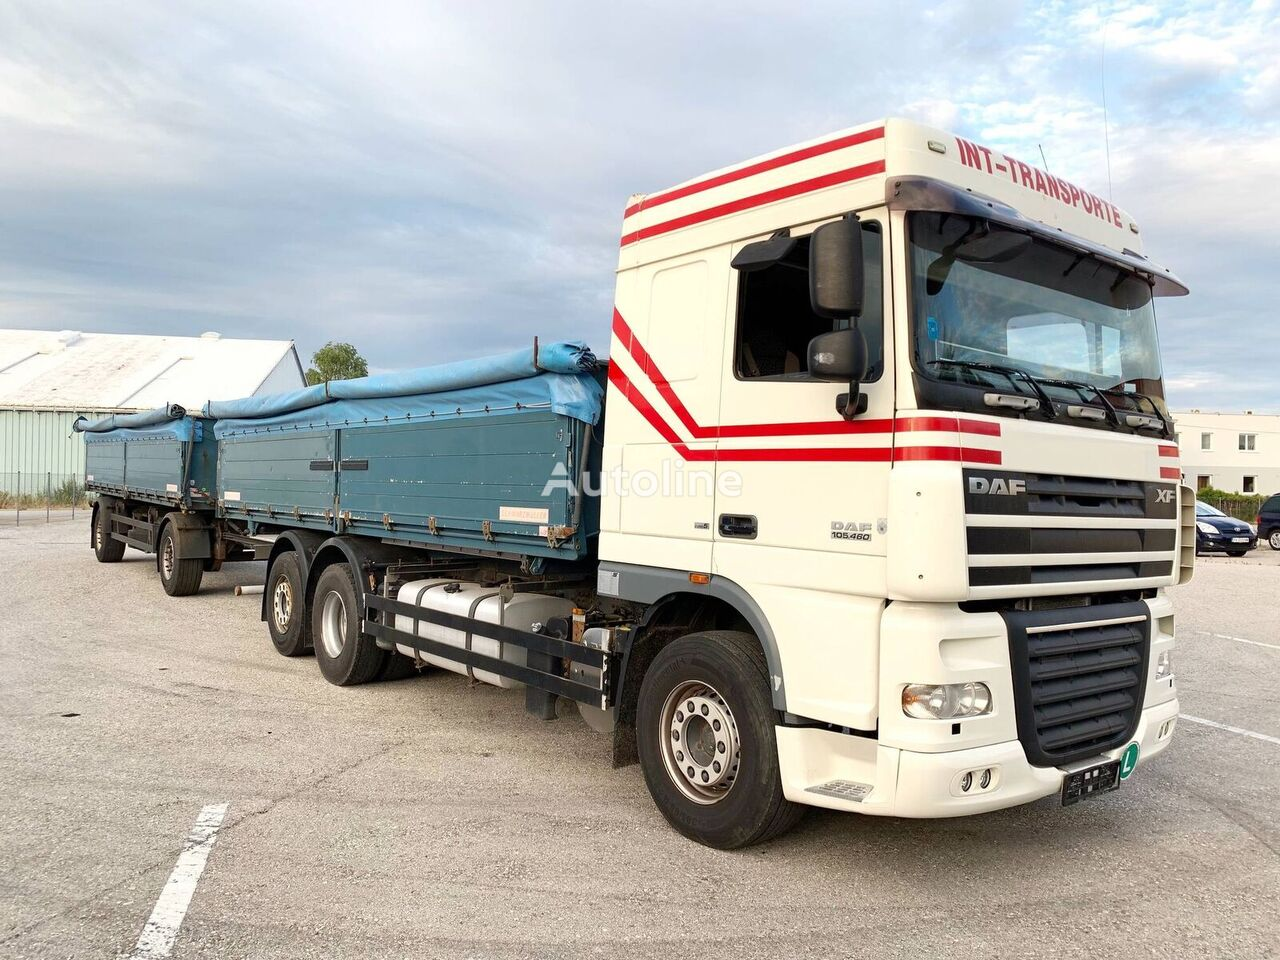 камион зърновоз DAF XF105.460 3-Seiten GETREIDEKIPPER + 2 Achs Kipp-Anhänger + ремарке за превоз на зърно